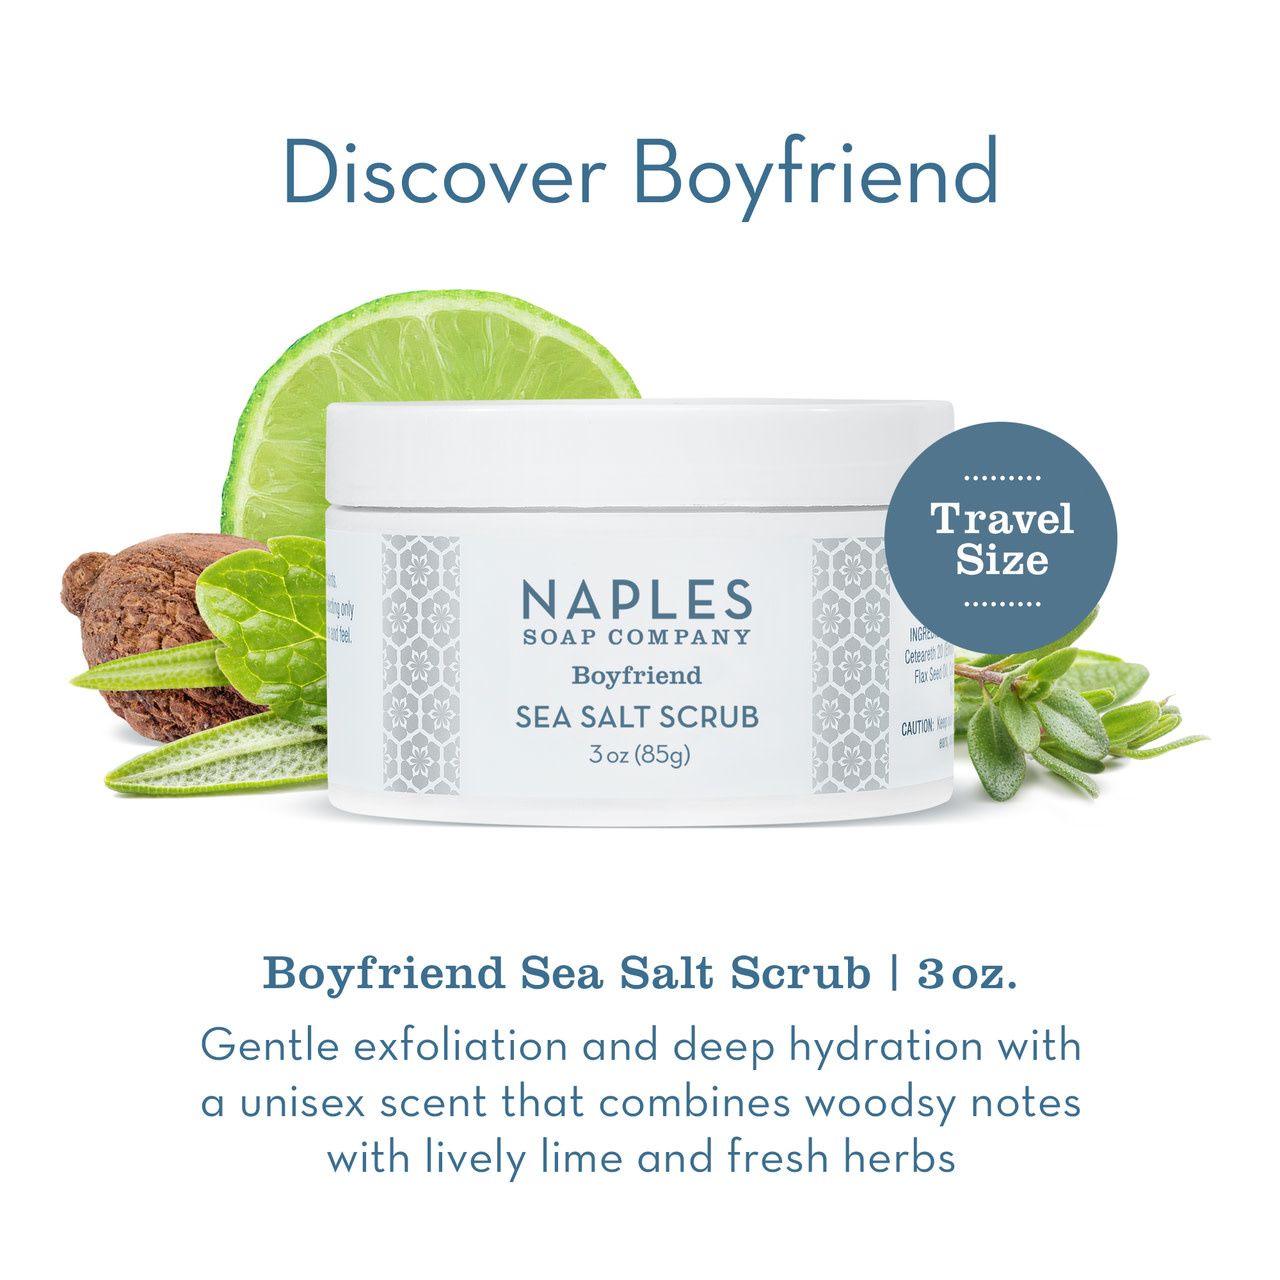 Naples Soap Co. Boyfriend Sea Salt Scrub 3 oz